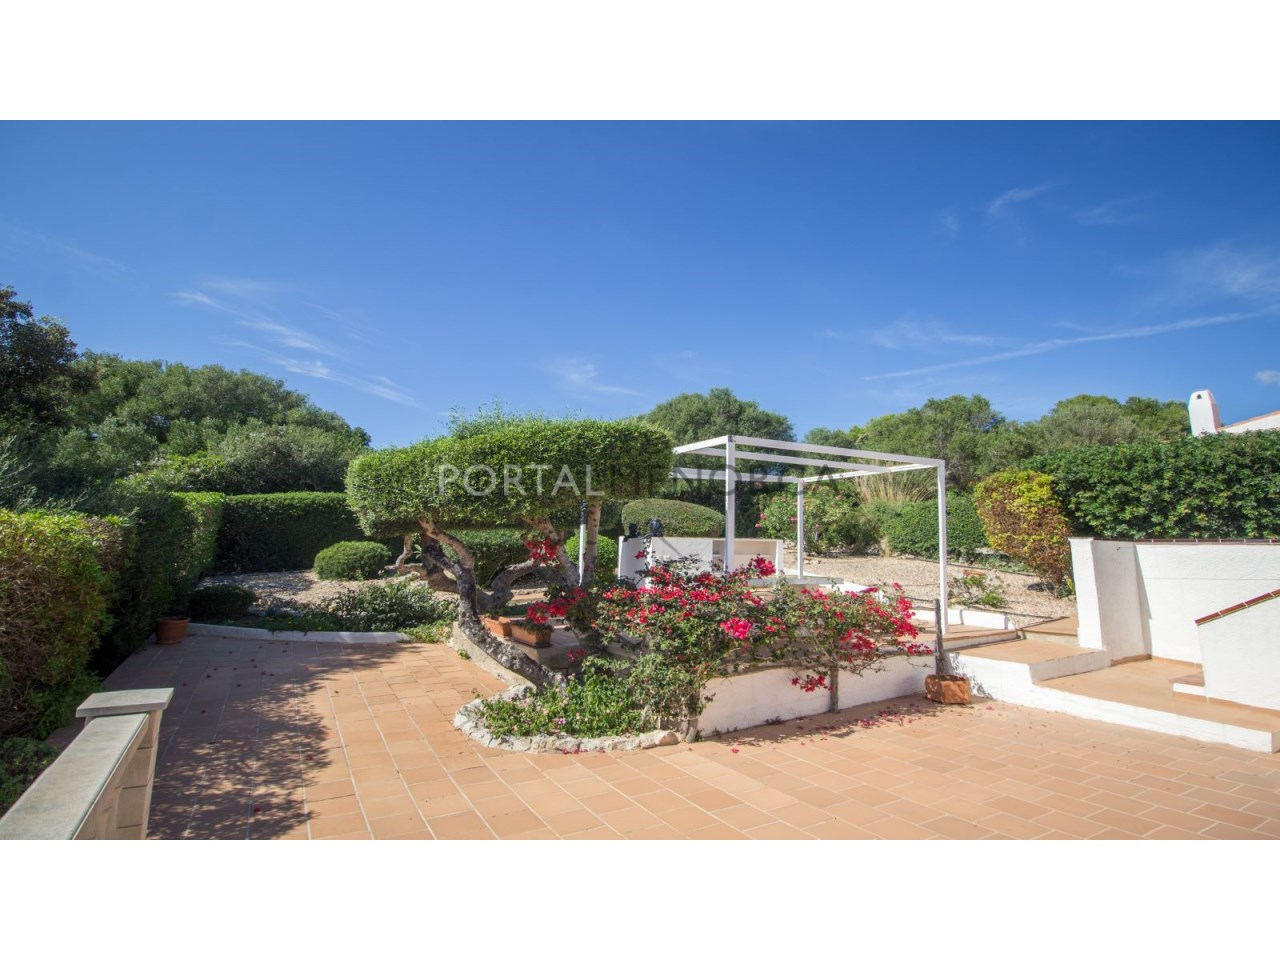 Villa for sale in Menorca with big terrace